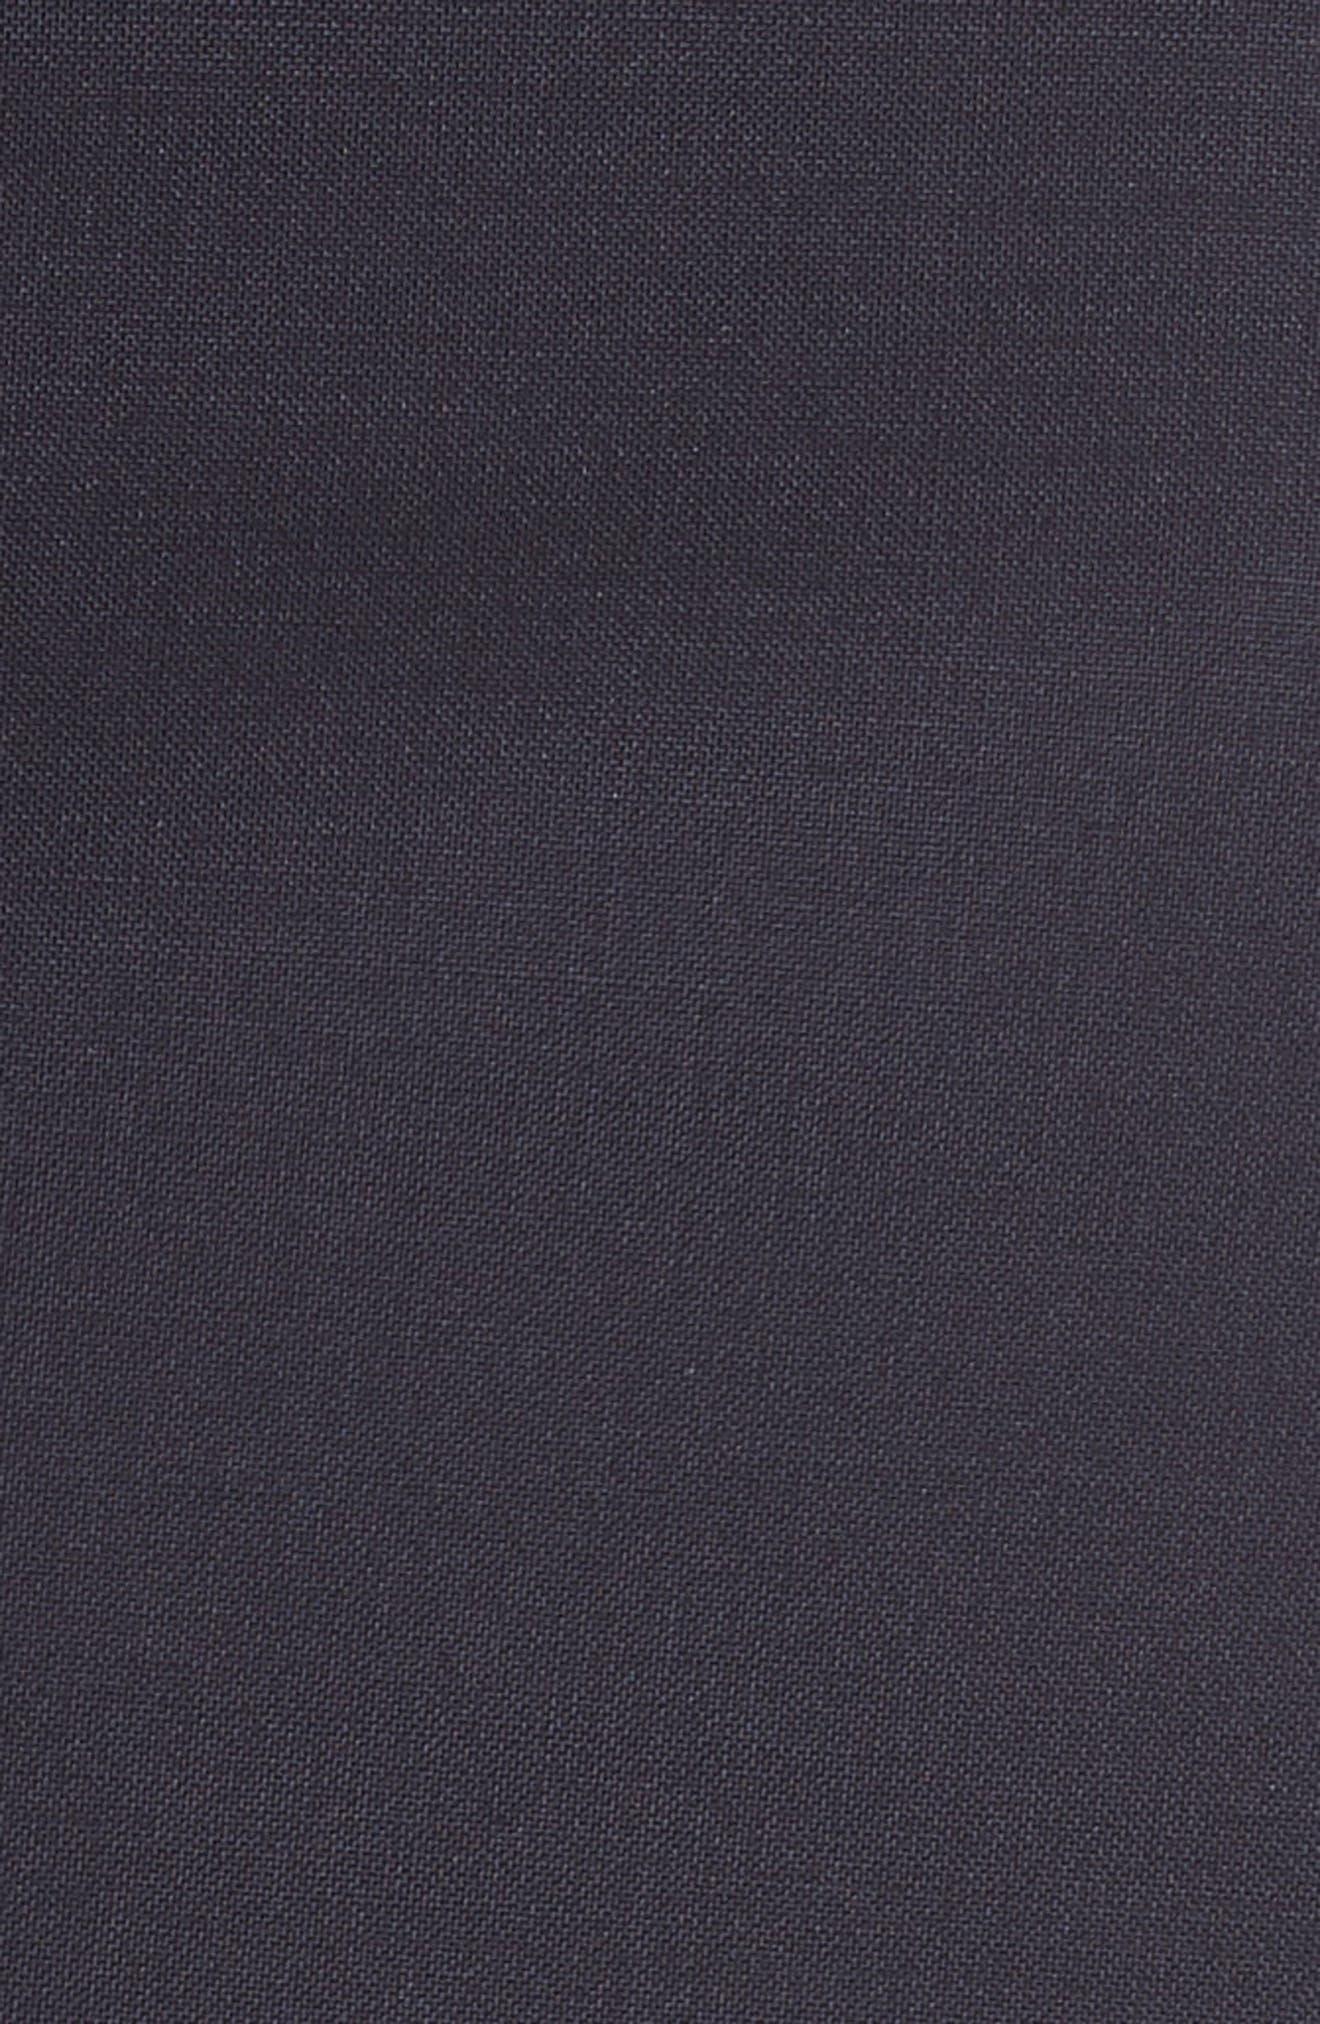 Wool & Mohair Suit,                             Alternate thumbnail 7, color,                             403